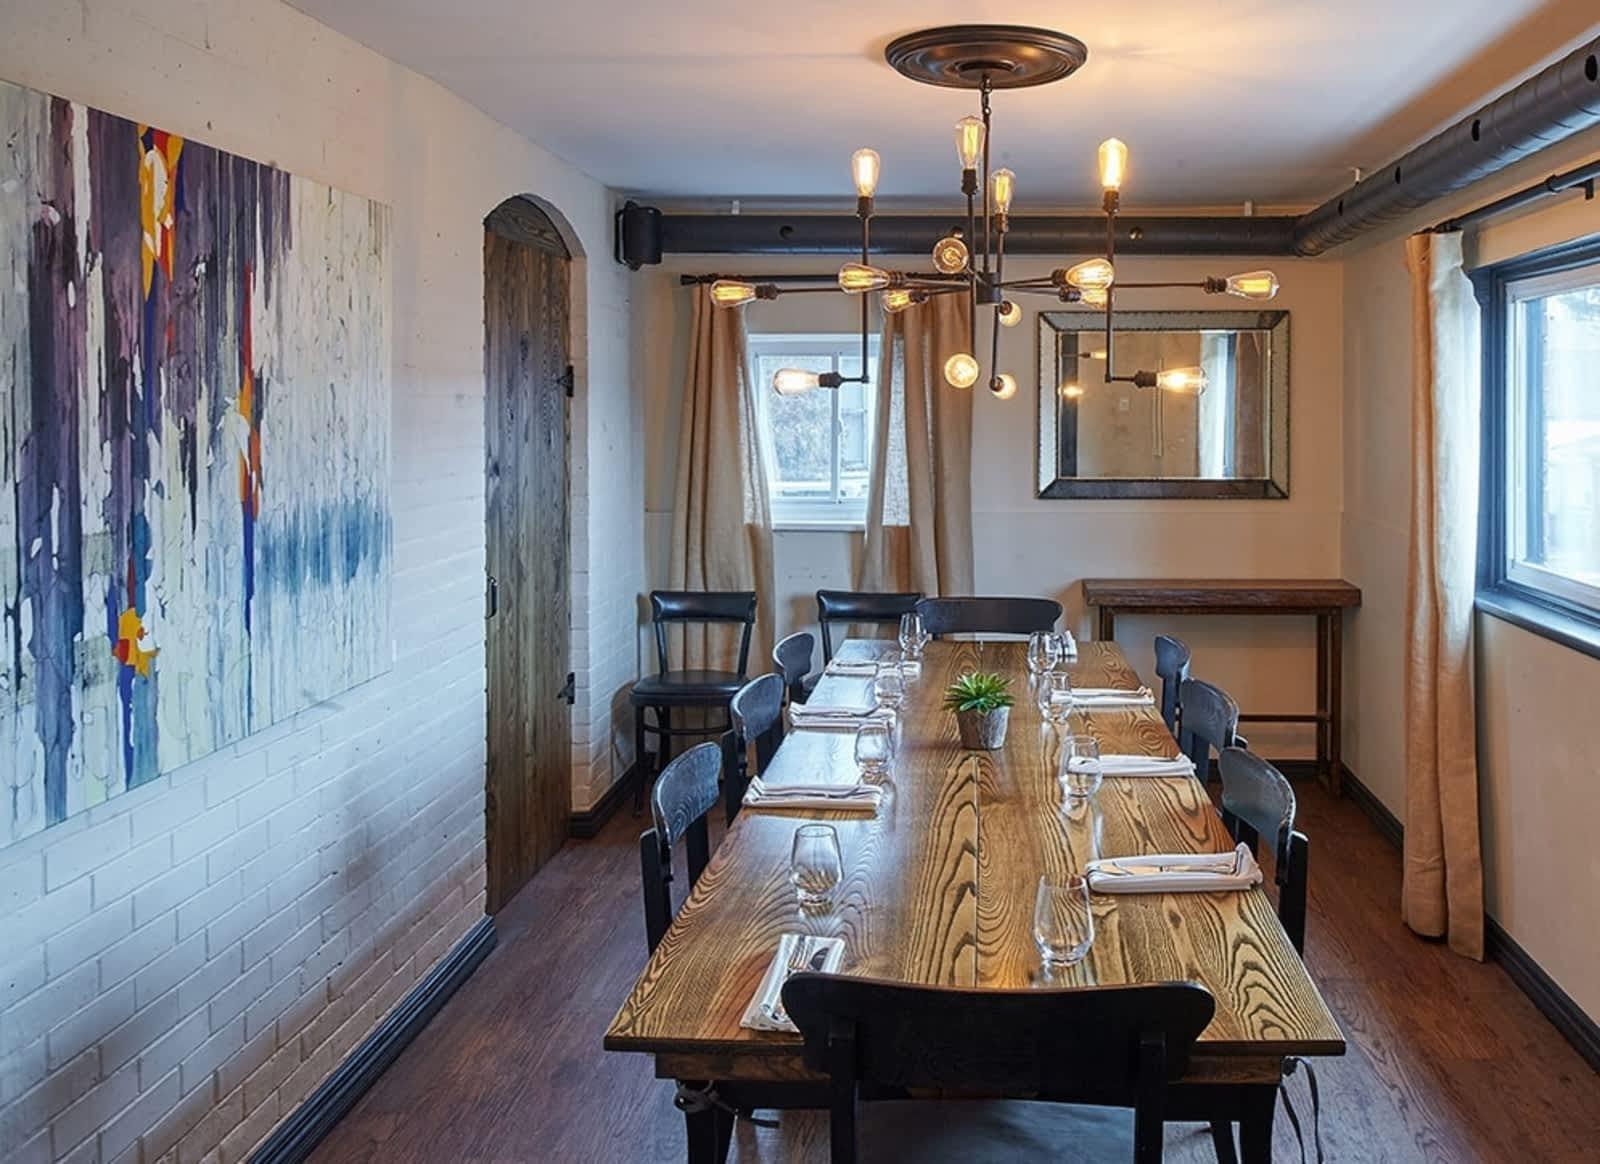 Brux House - Menu, Hours & Reservation - 137 Locke St S